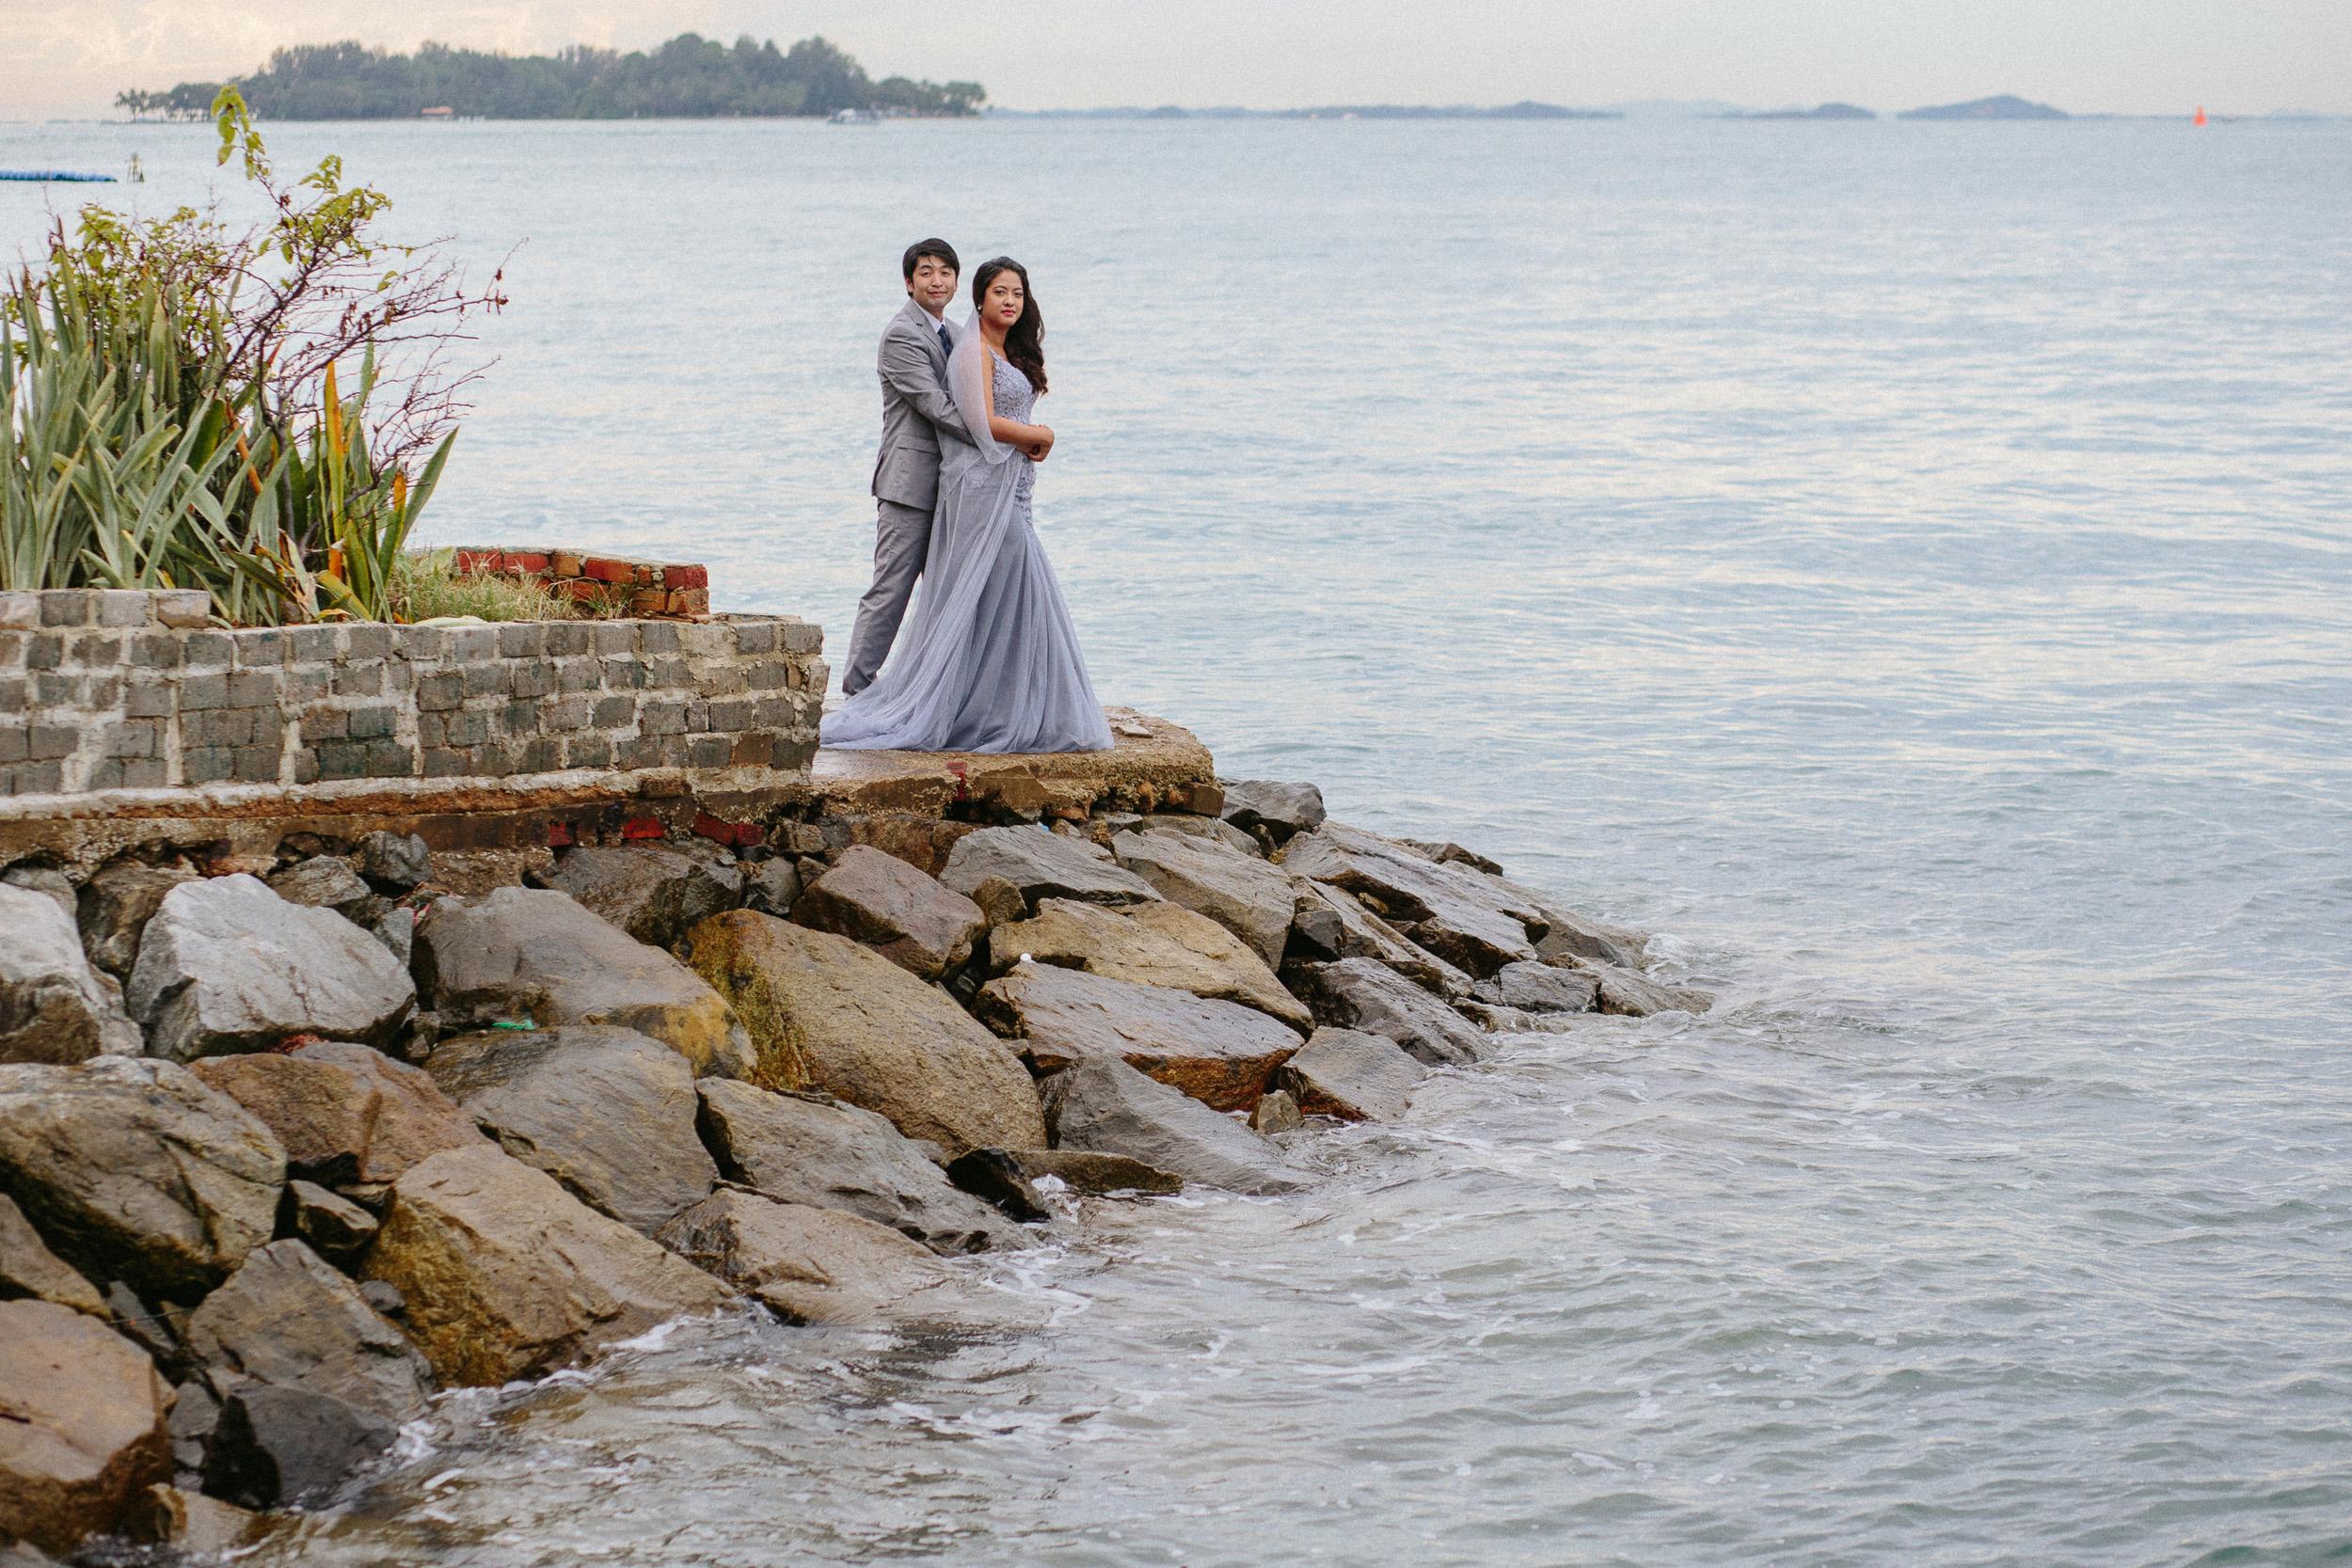 singapore-wedding-photographer-photography-wmt2017-020.jpg